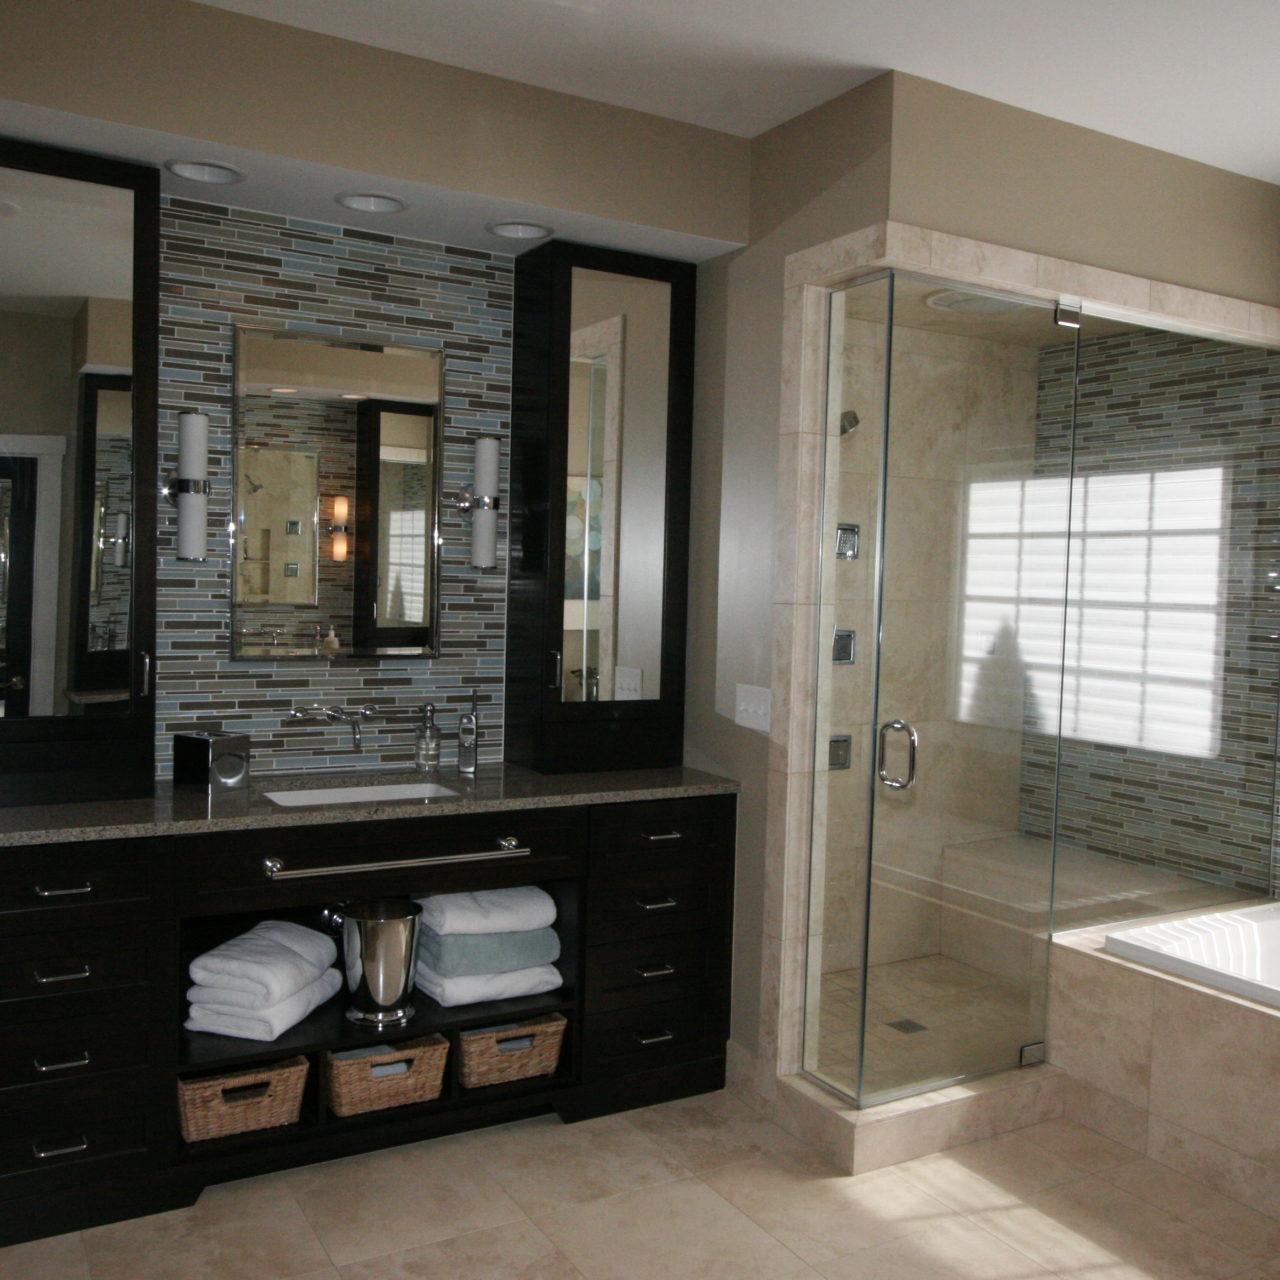 https://creativecabinetryinc.com/wp-content/uploads/2016/12/p-bathroom-vanity-contemporary-shaker-retro-design.-1280x1280.jpg